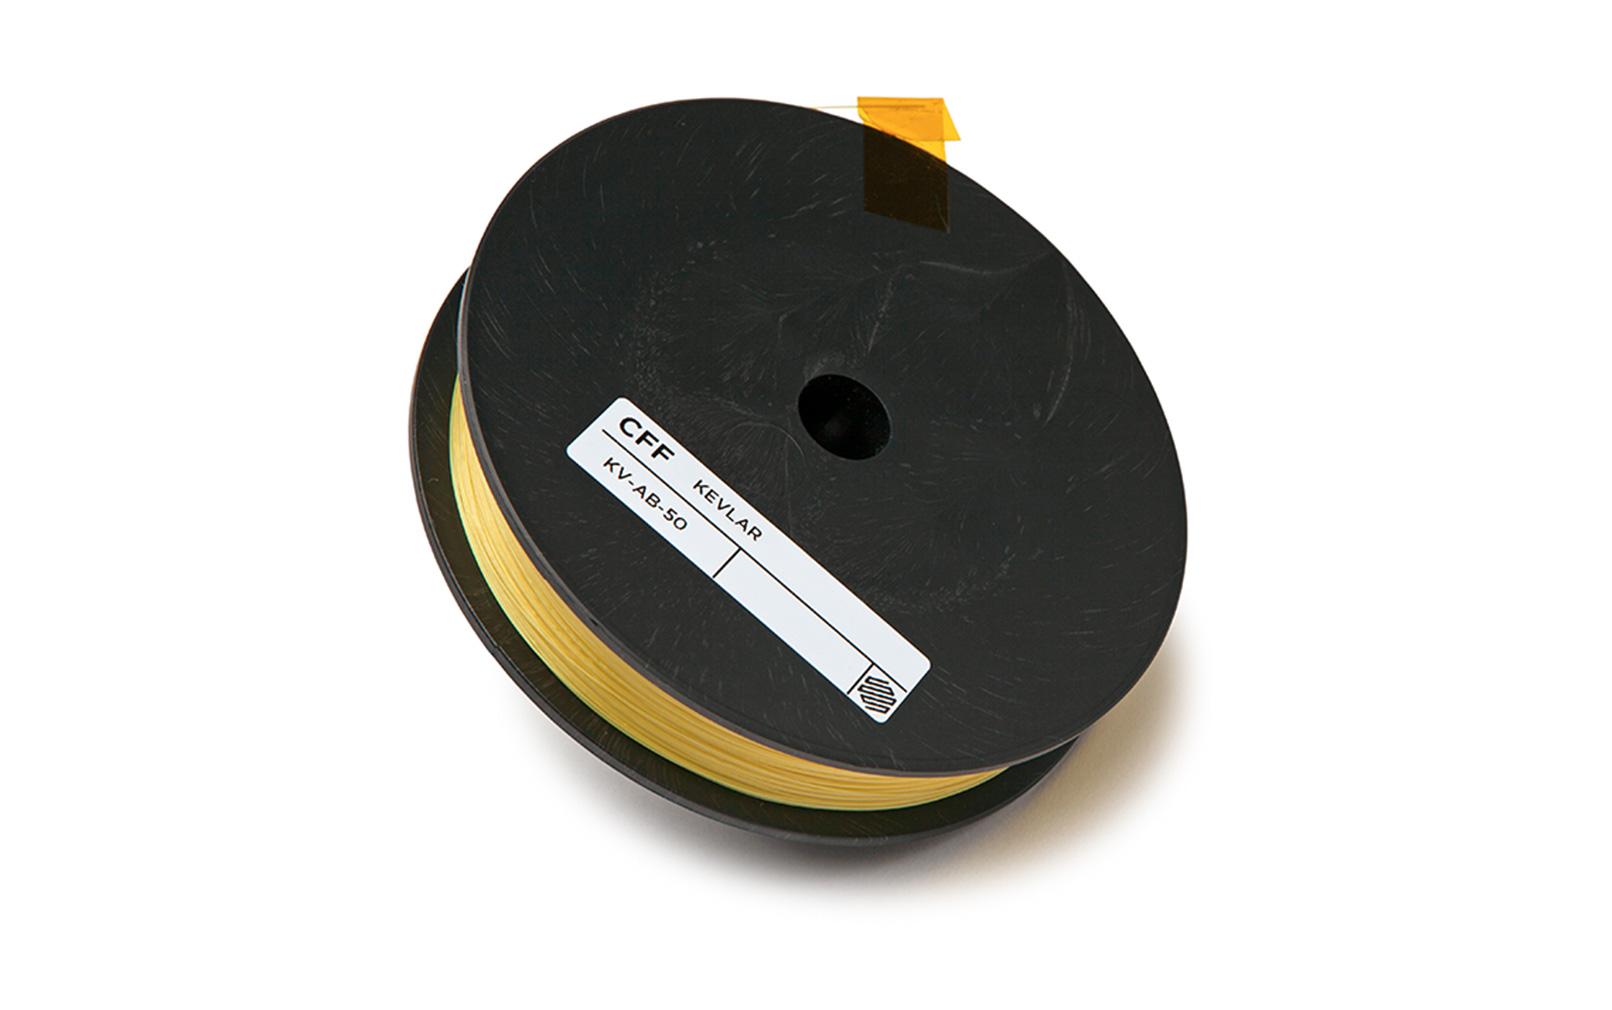 Markforged kevlar filament. Image via Markforged.